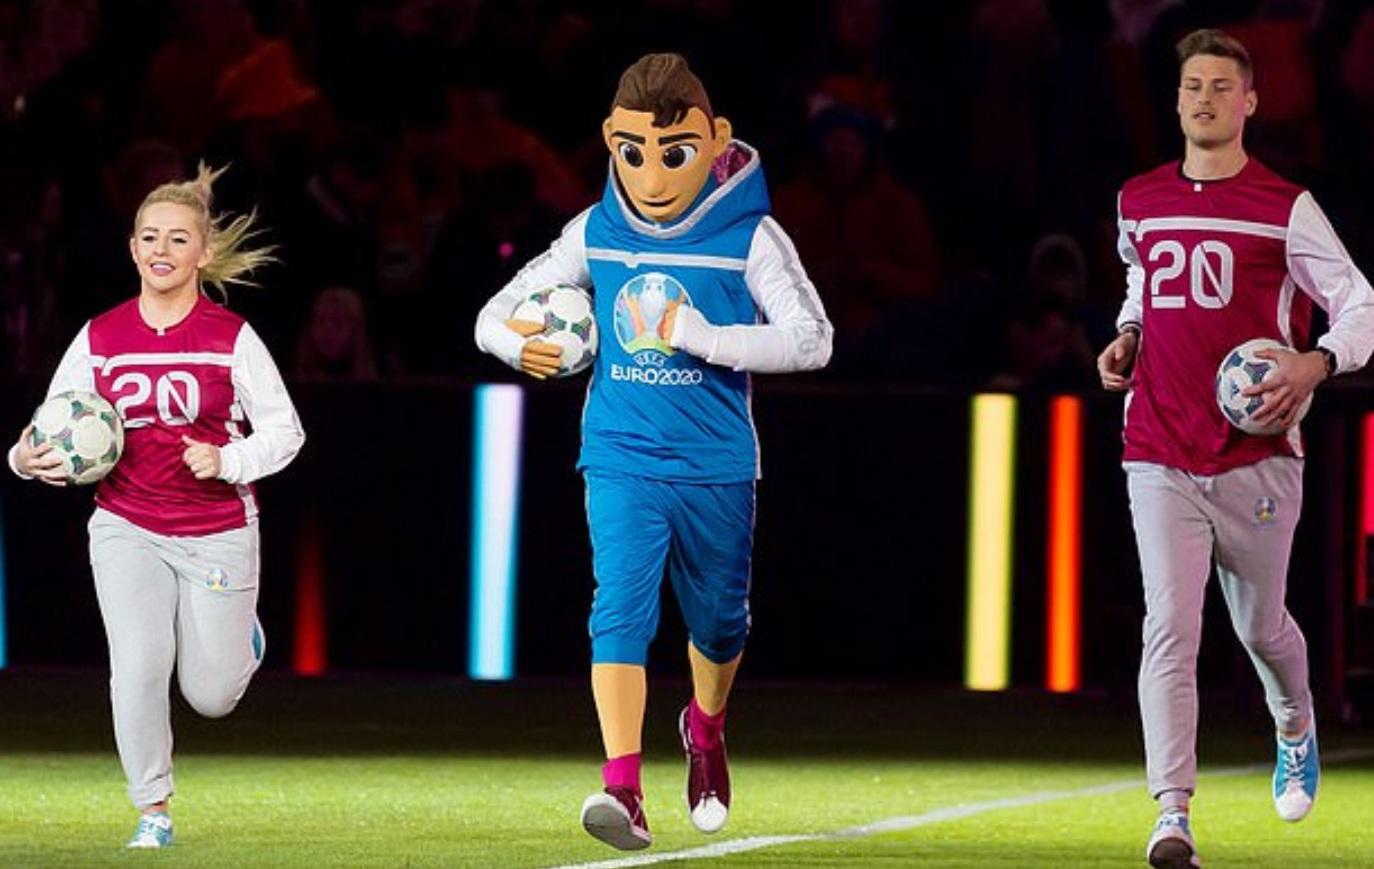 Skilzzy Promoting Street Football